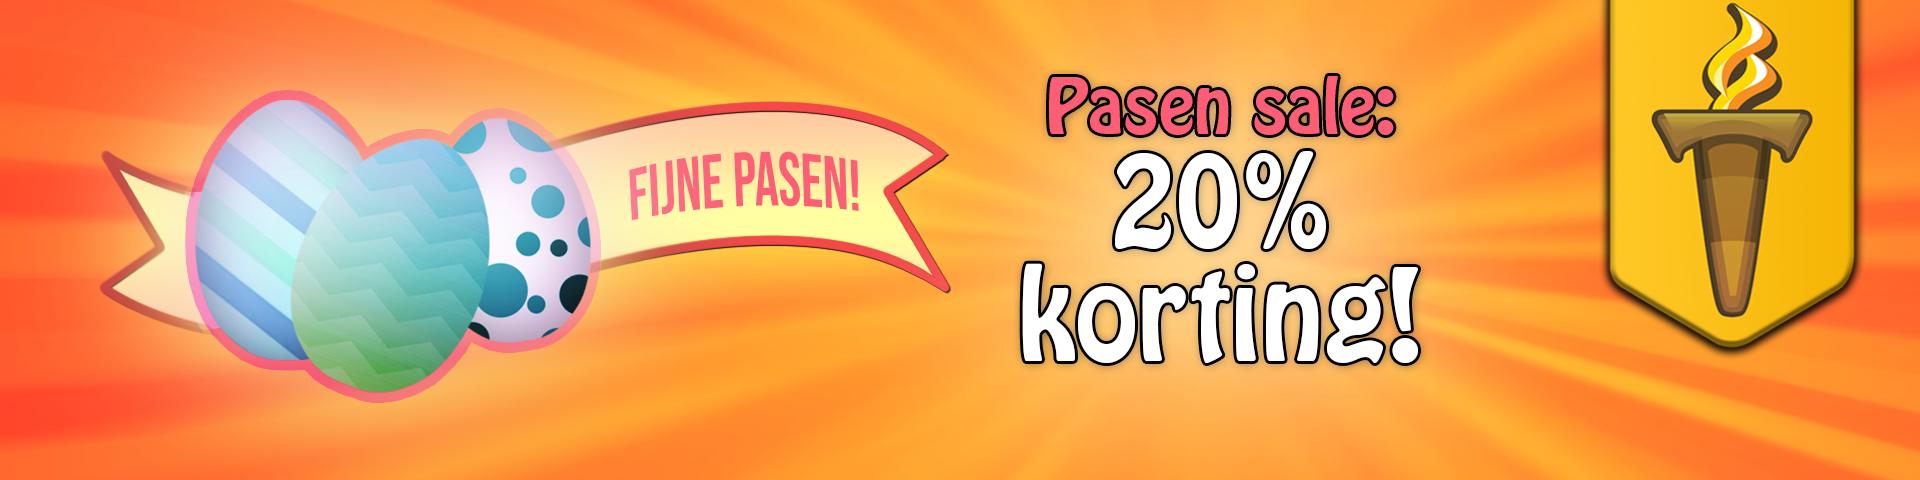 PasenTC01.png